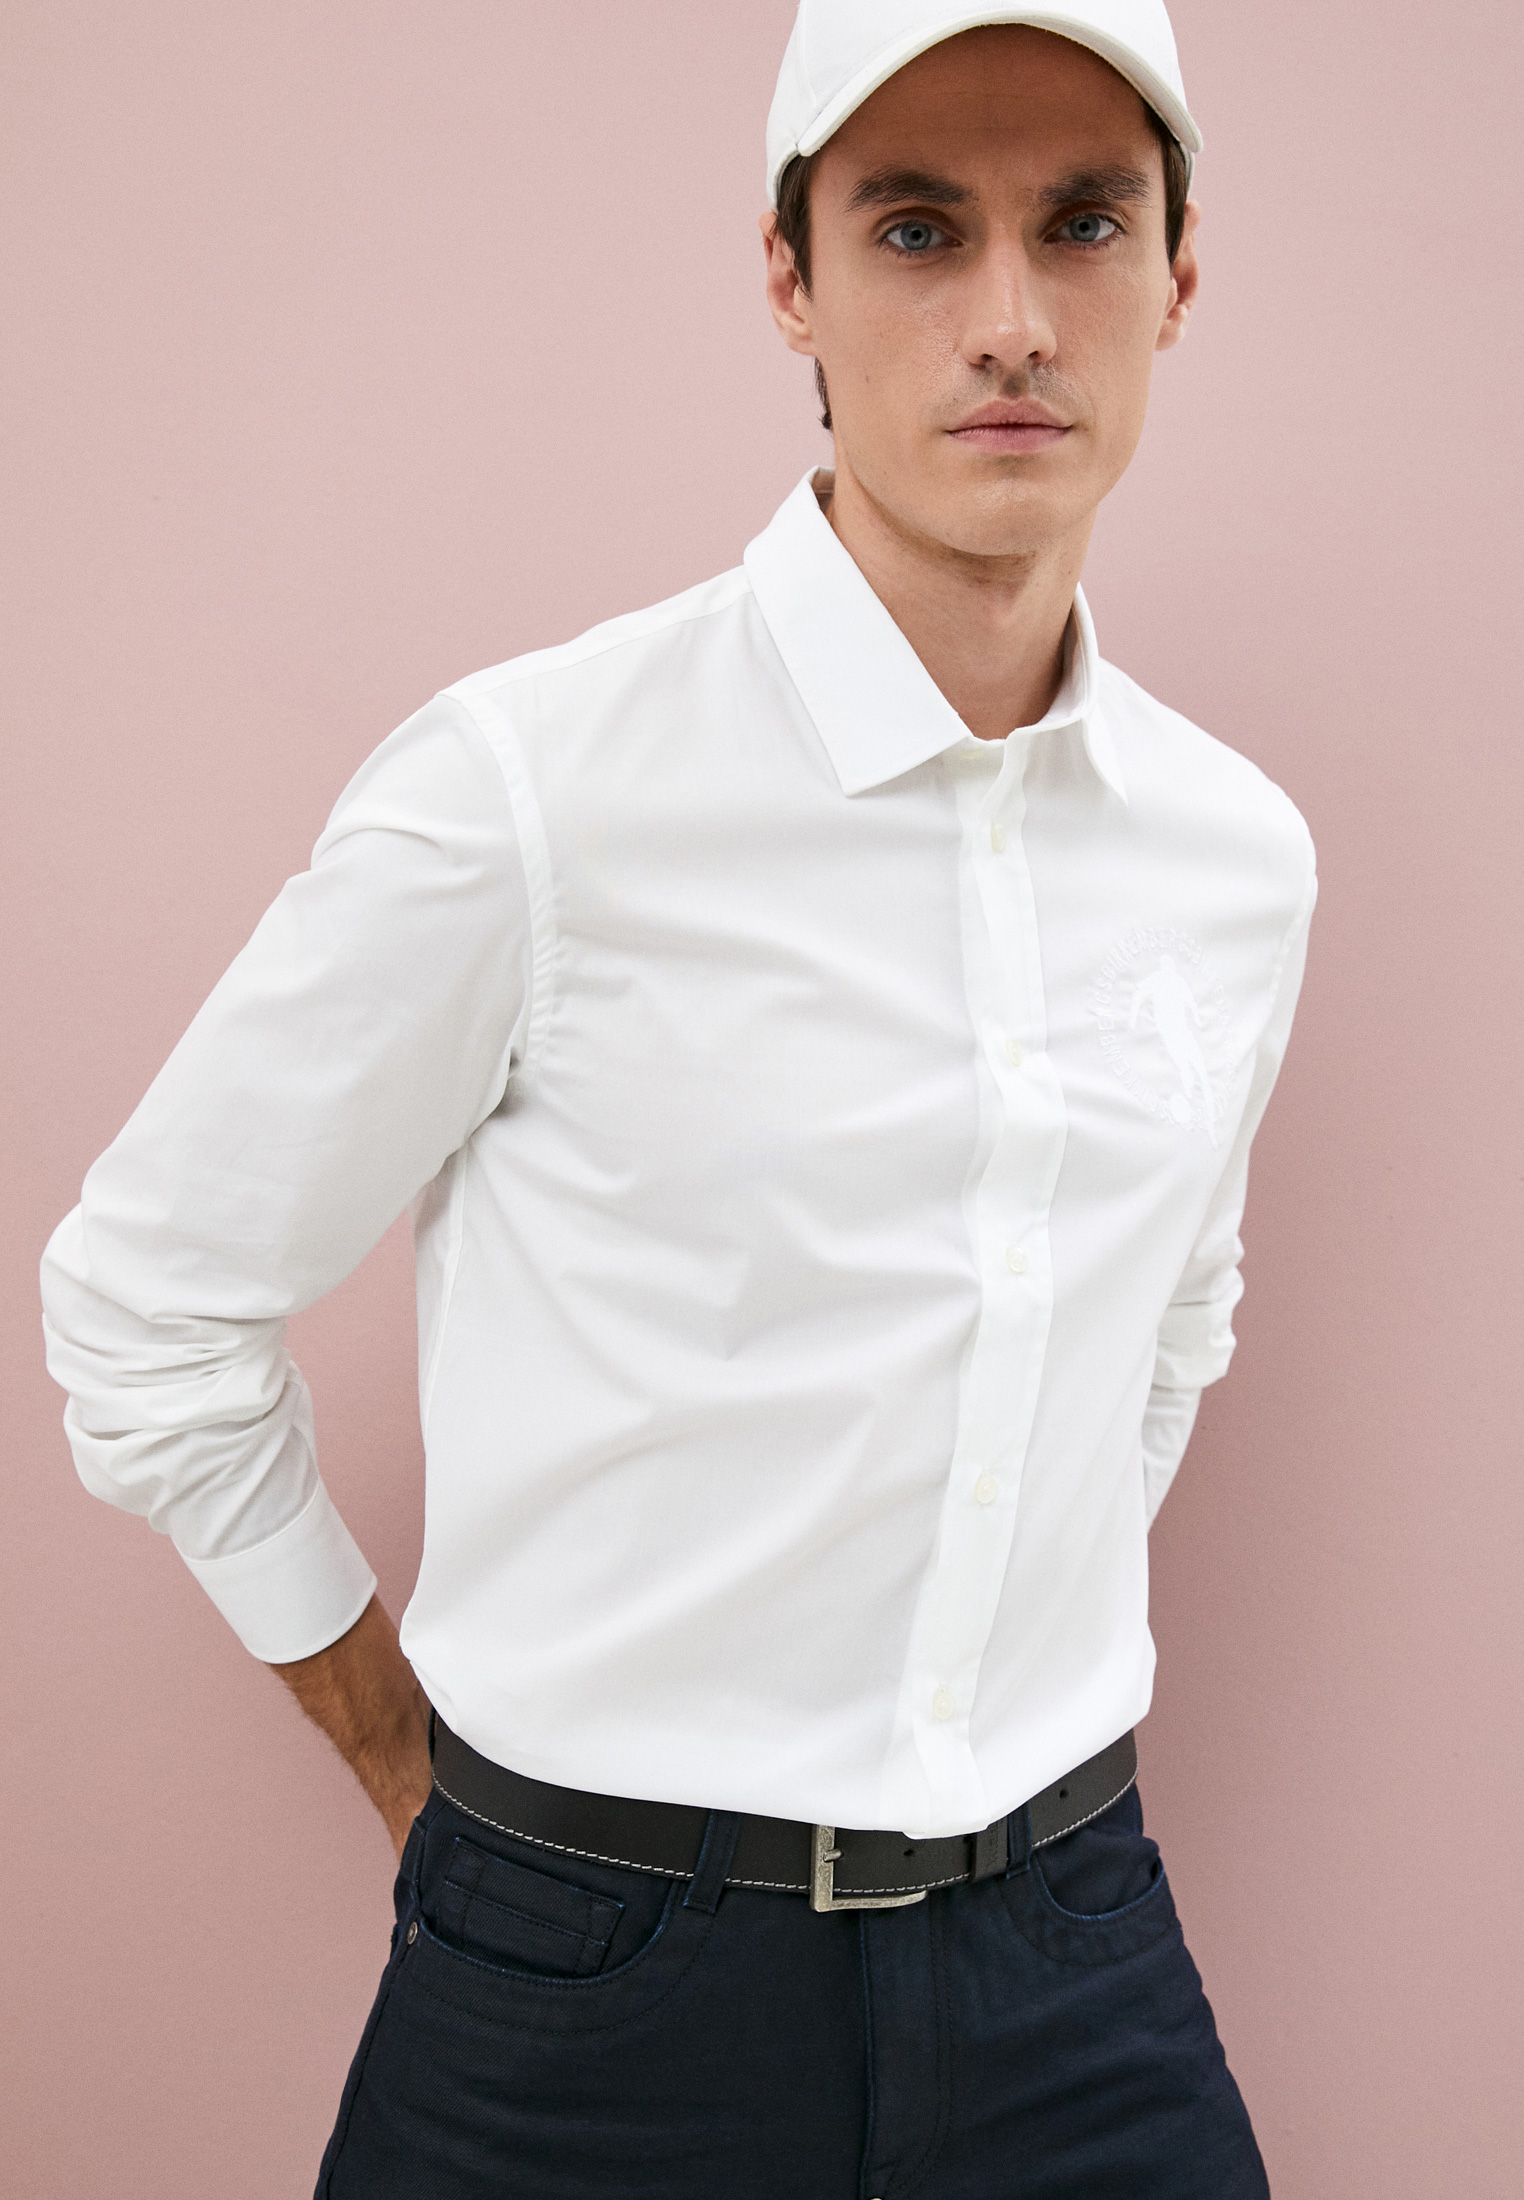 Рубашка с длинным рукавом Bikkembergs (Биккембергс) C C 009 2C S 2931: изображение 8